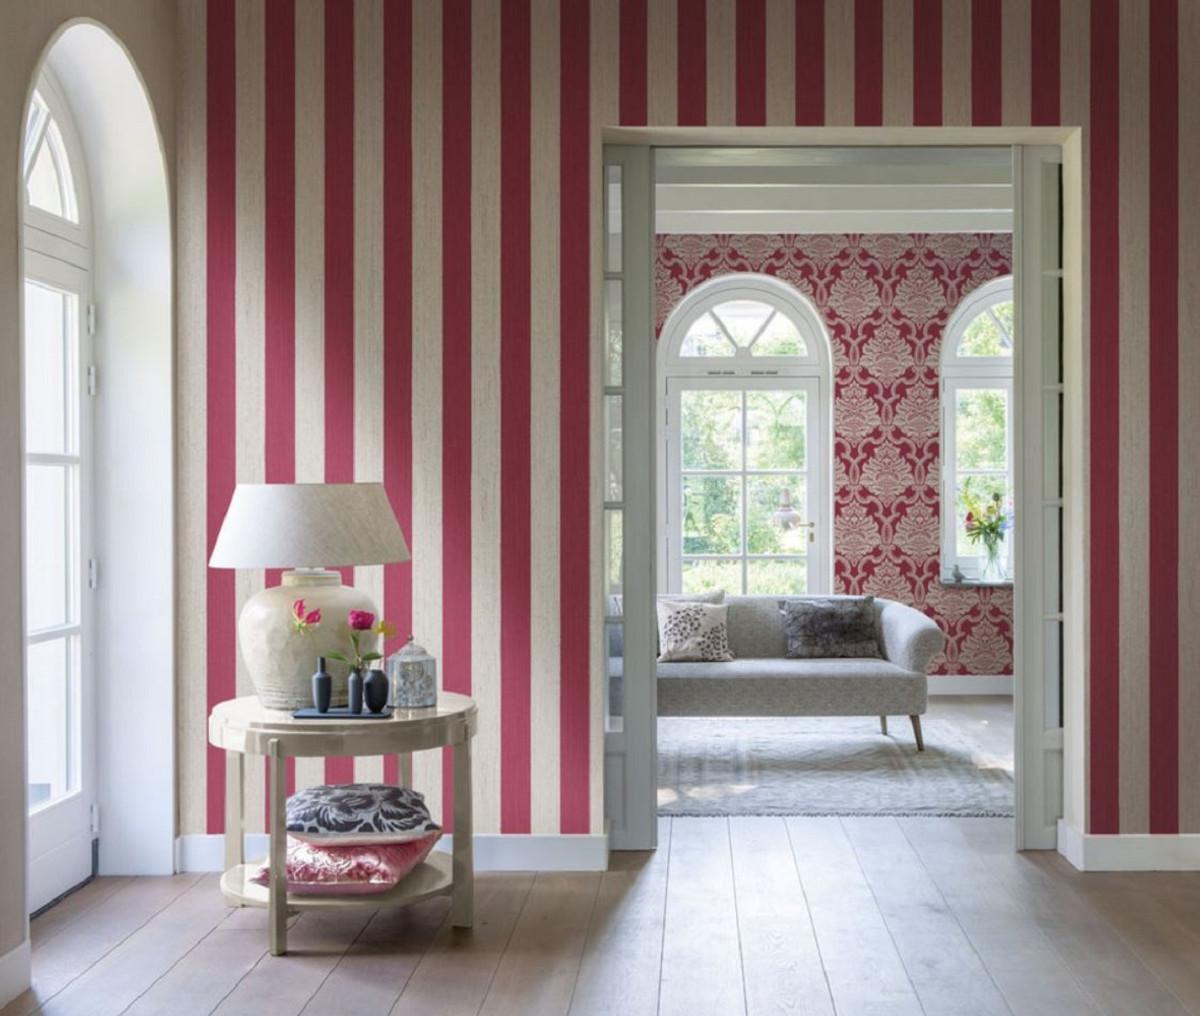 Casa Padrino Barock Textiltapete Rot 10,05 x 0,53 m - Barock Tapete - Deko  Accessoires